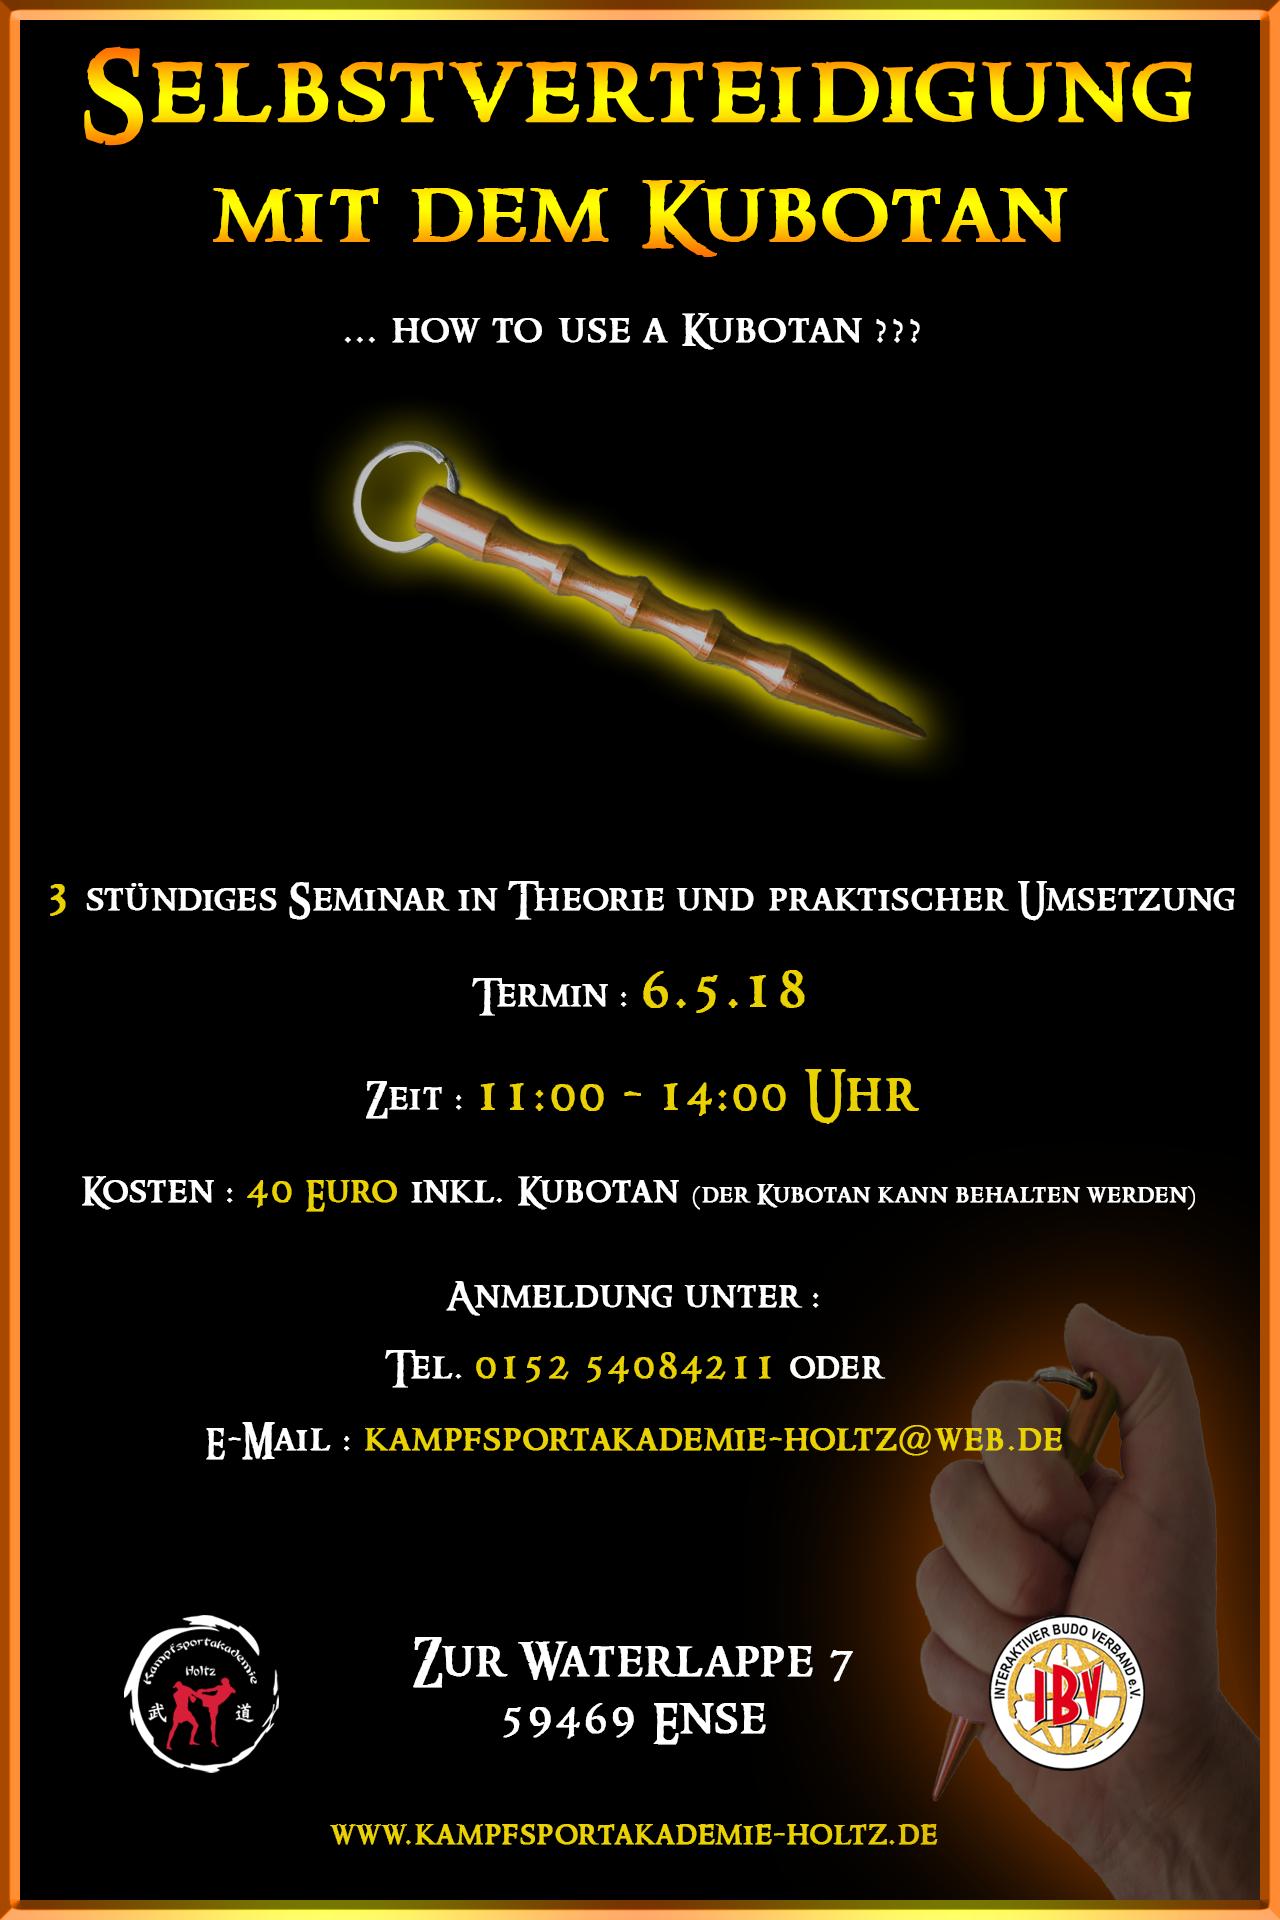 Kubotan-Seminar-Kampfsportakademie-Holtz